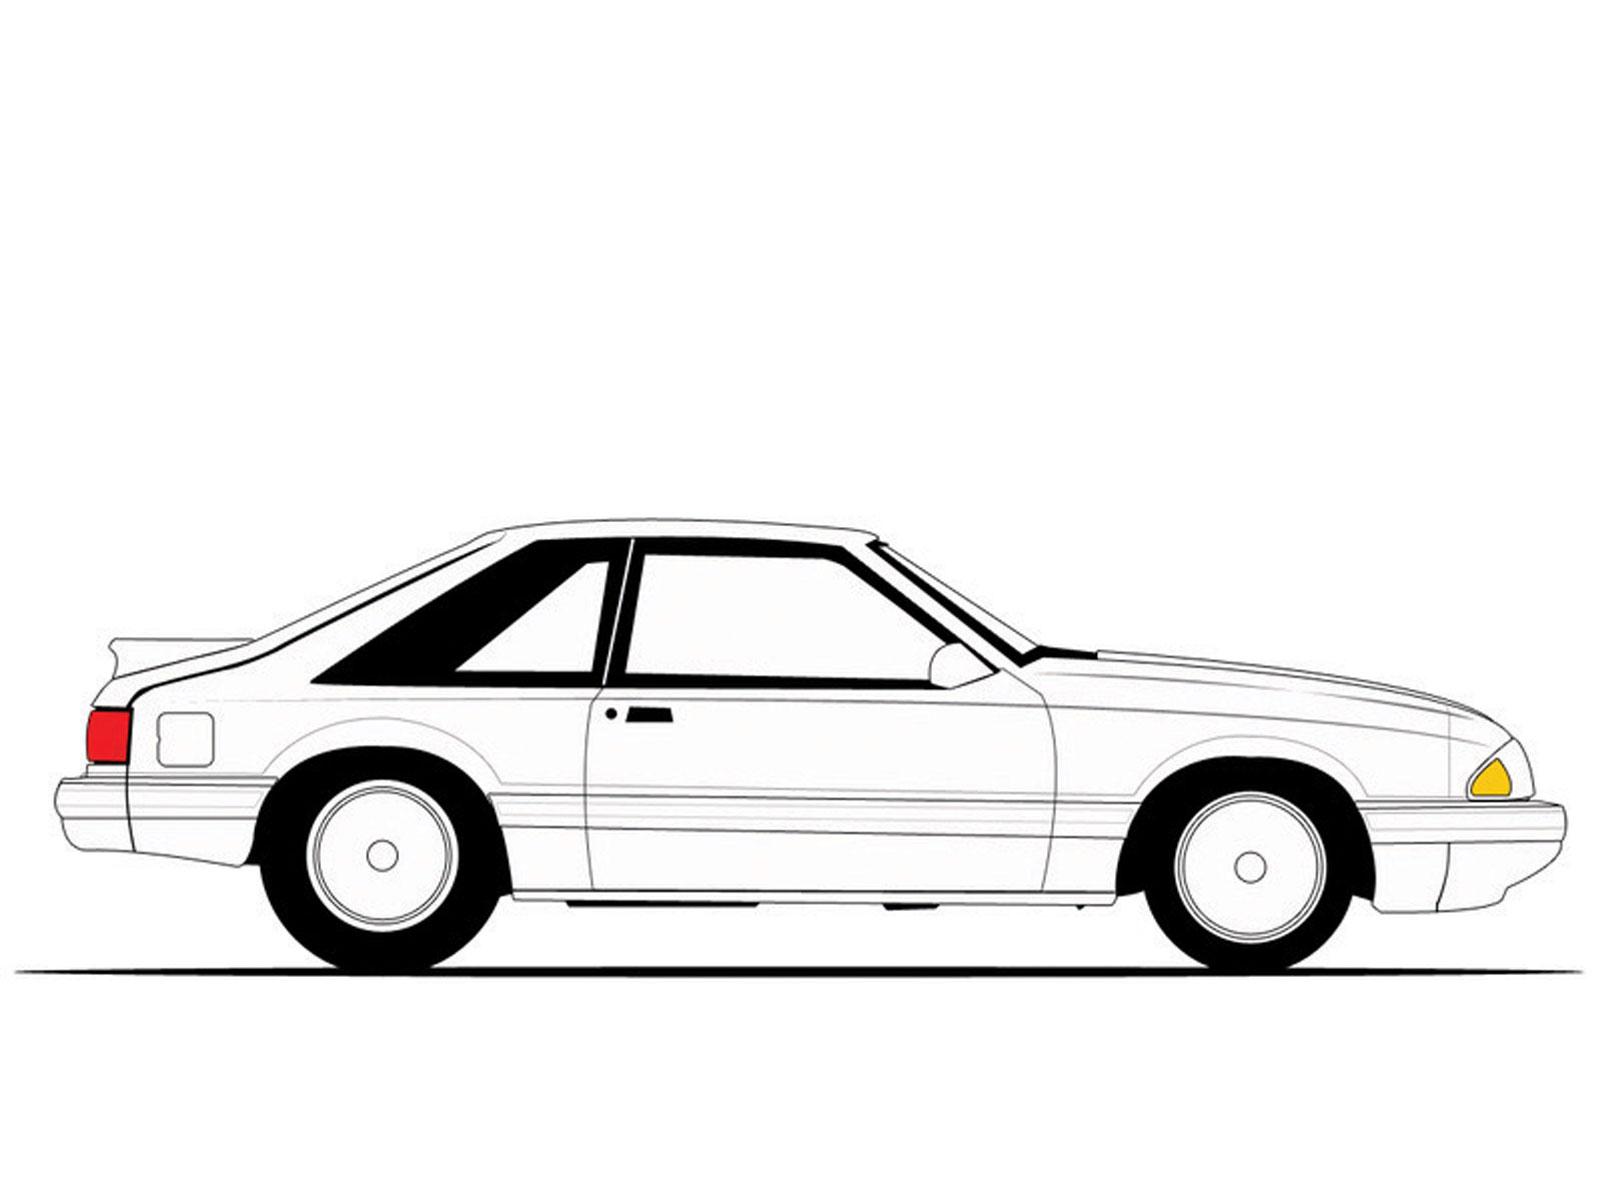 1600x1200 Images For Car Outline Logo